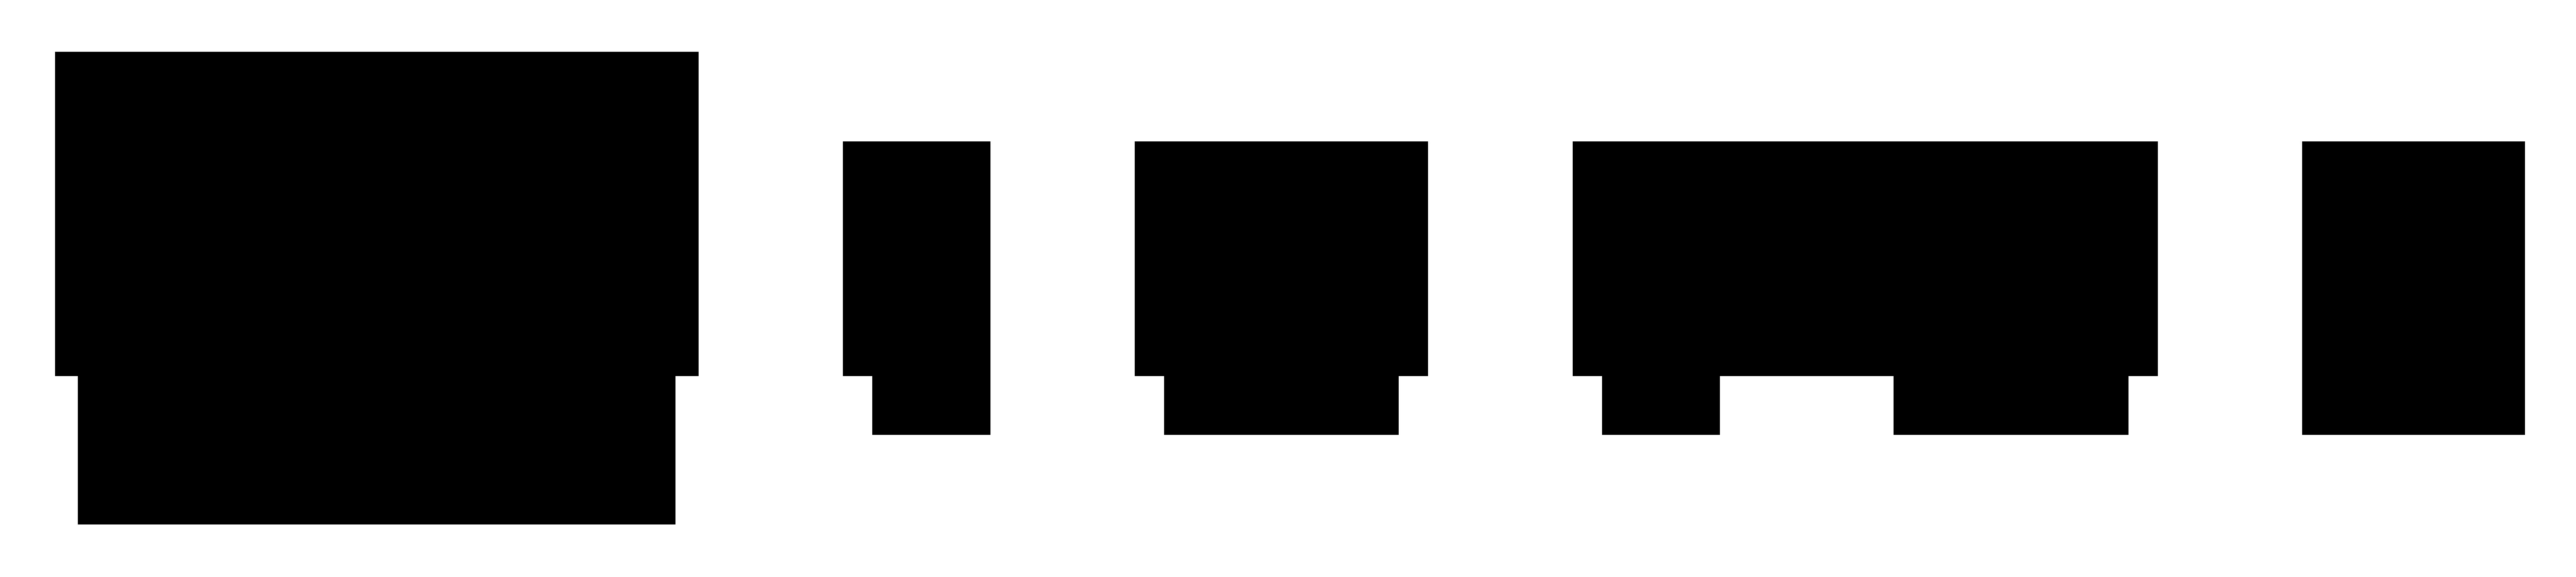 Logo for COCON studio